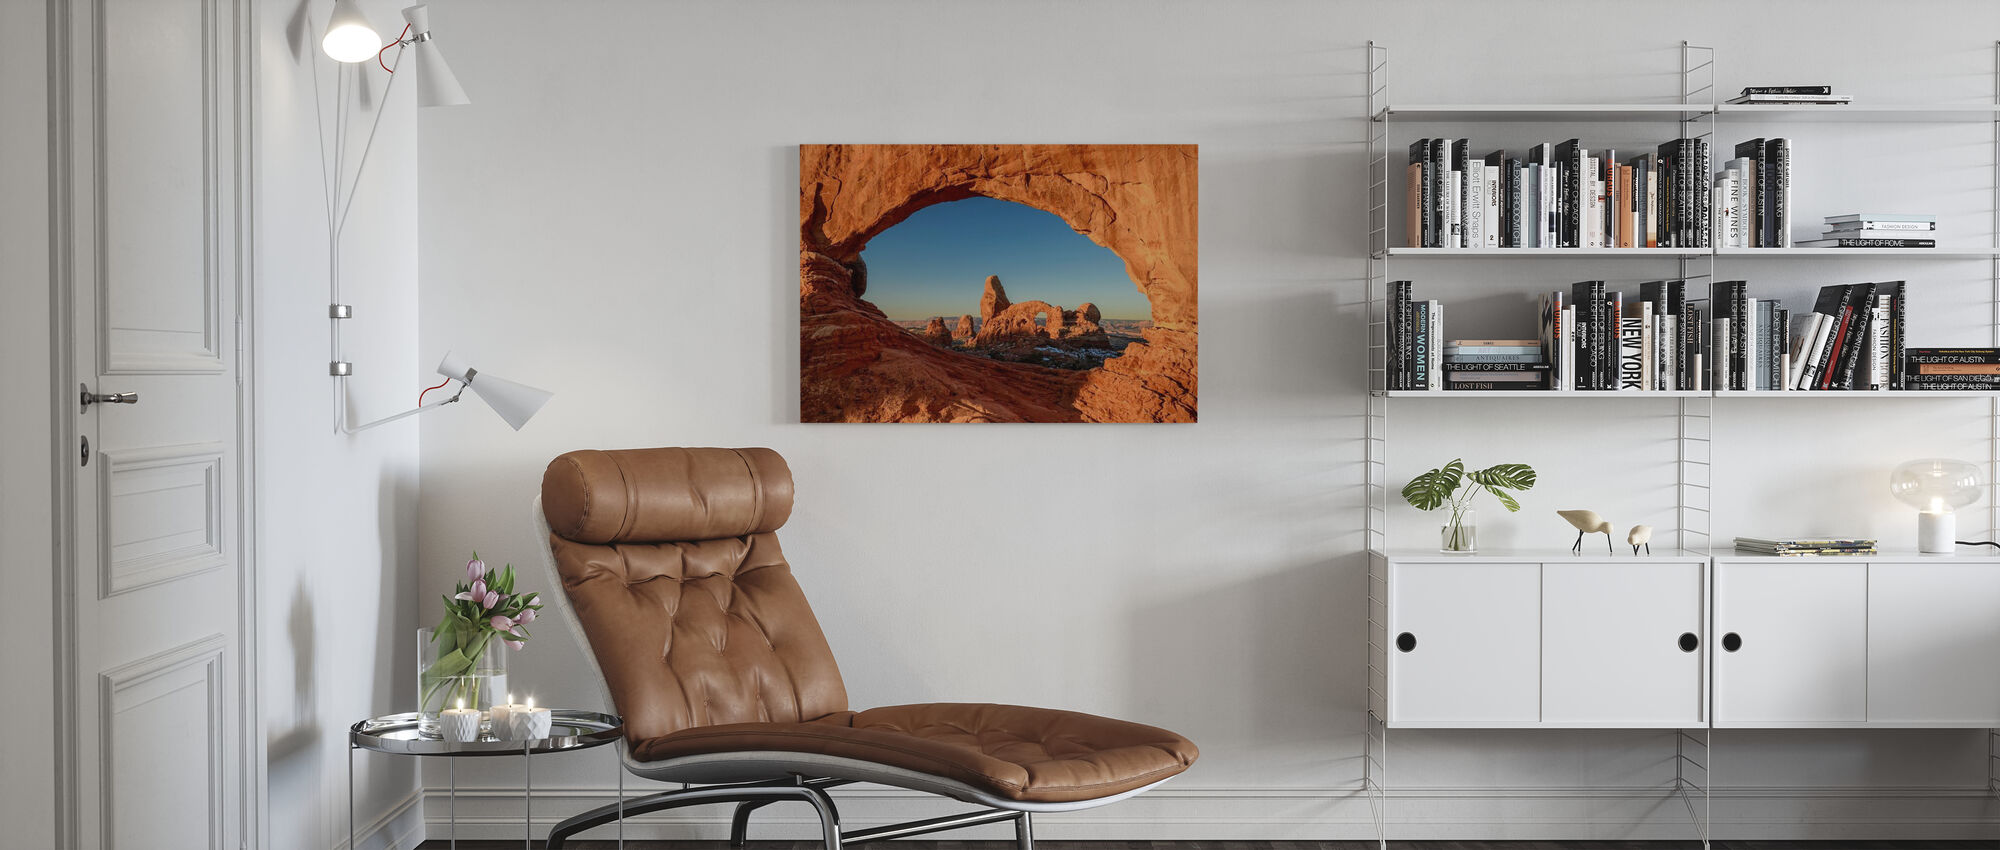 Natural Window - Canvas print - Living Room